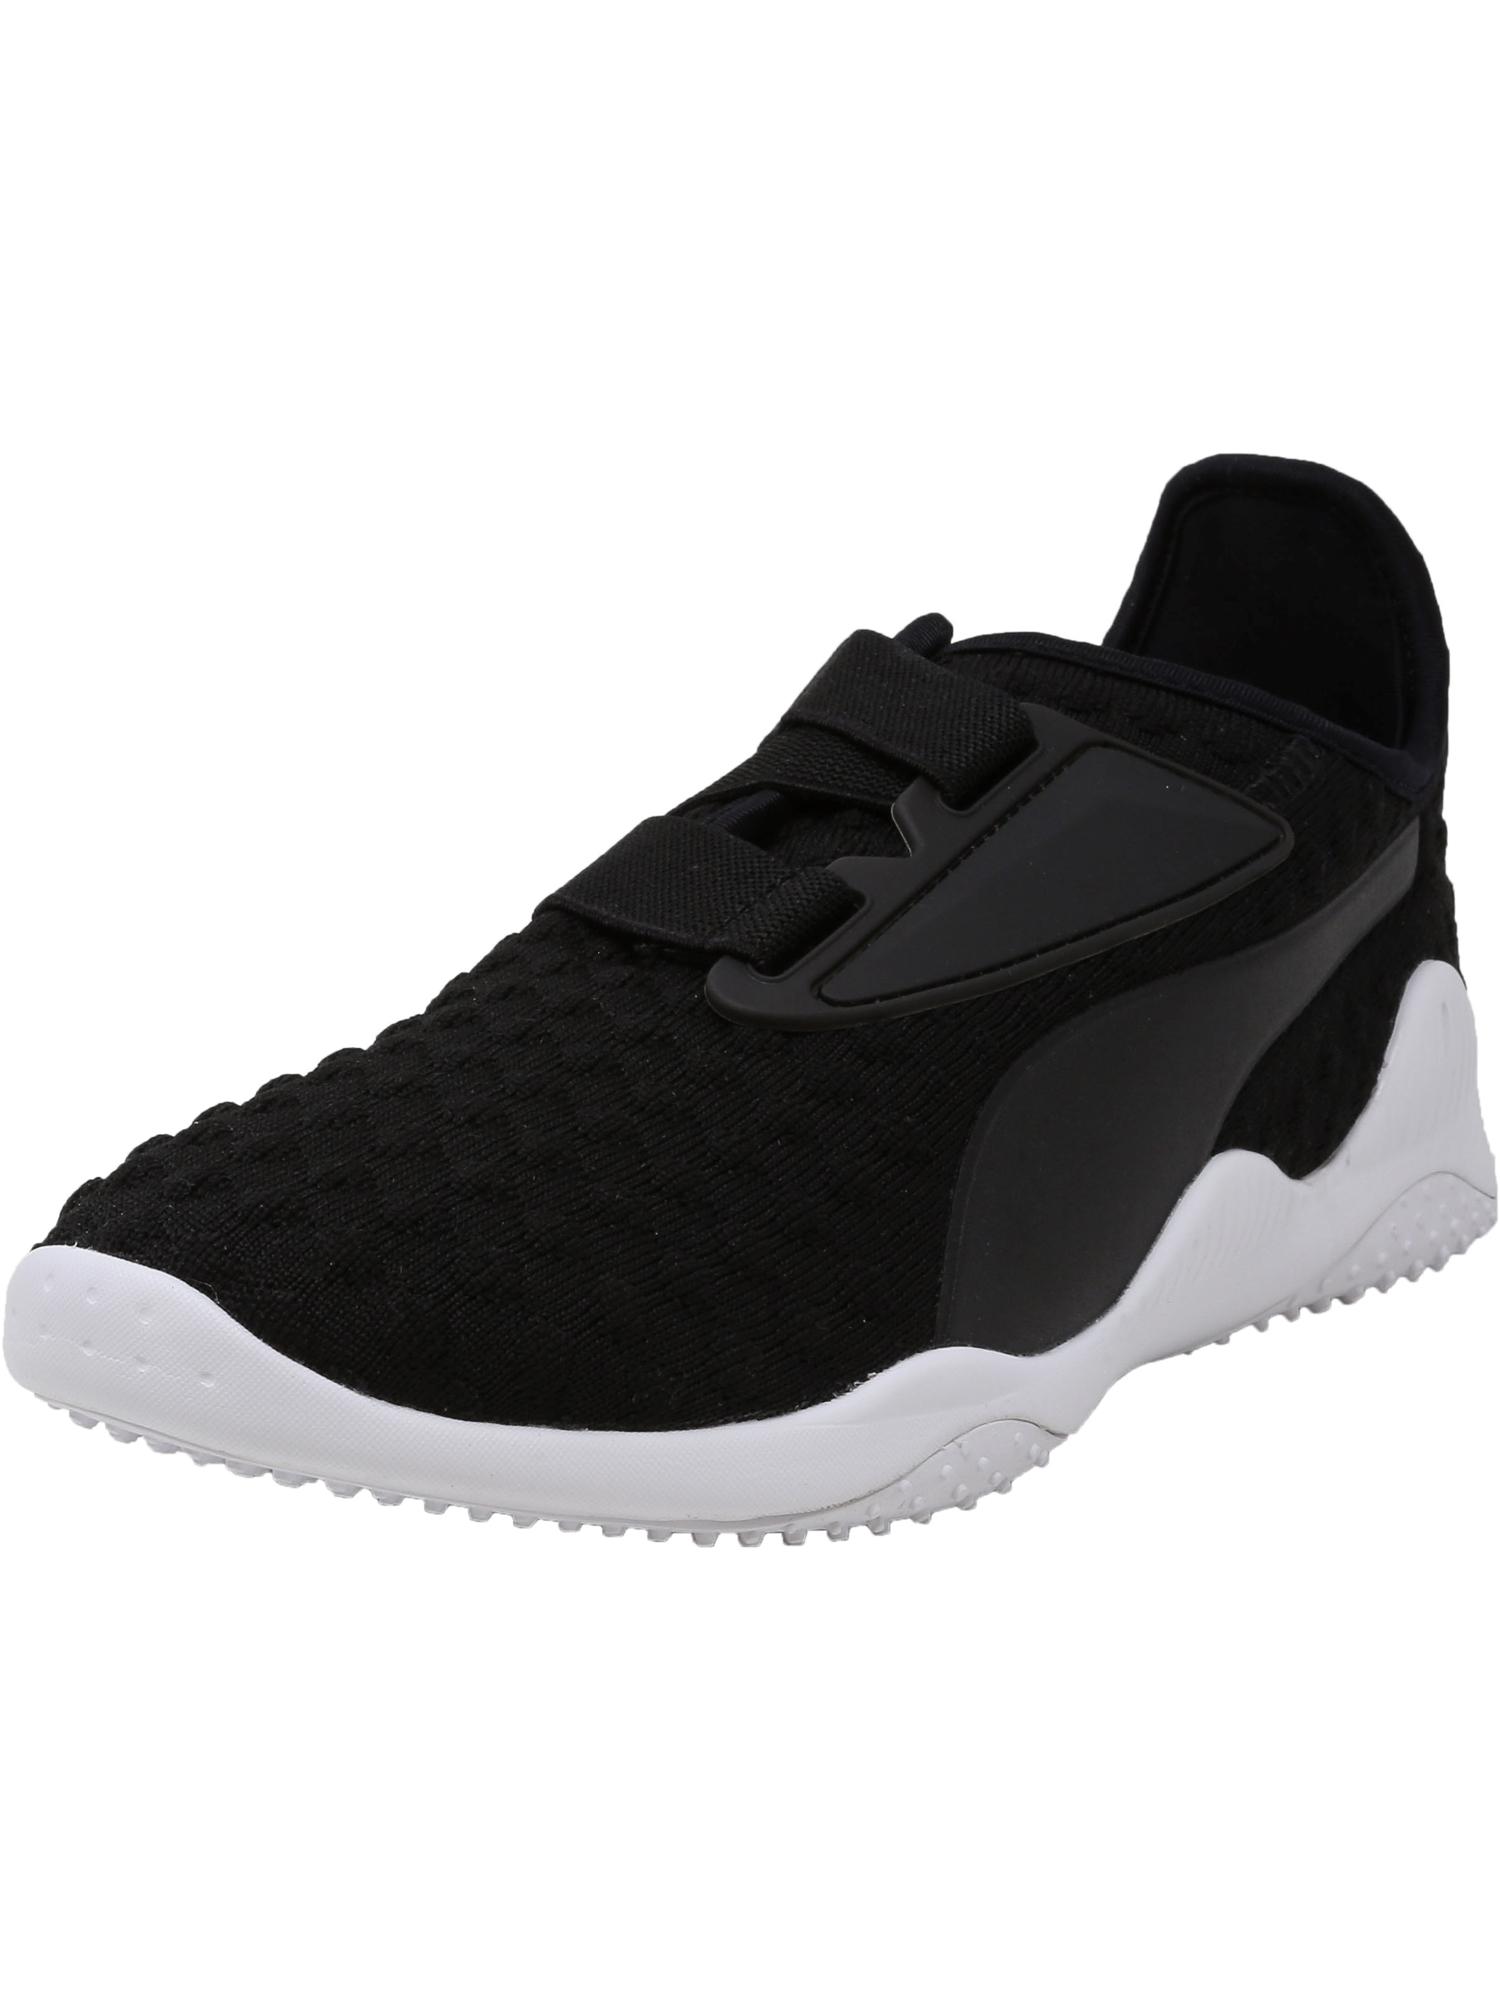 Puma Men's Mostro Bubble Knit Black / White Ankle-High Running Shoe - 12M